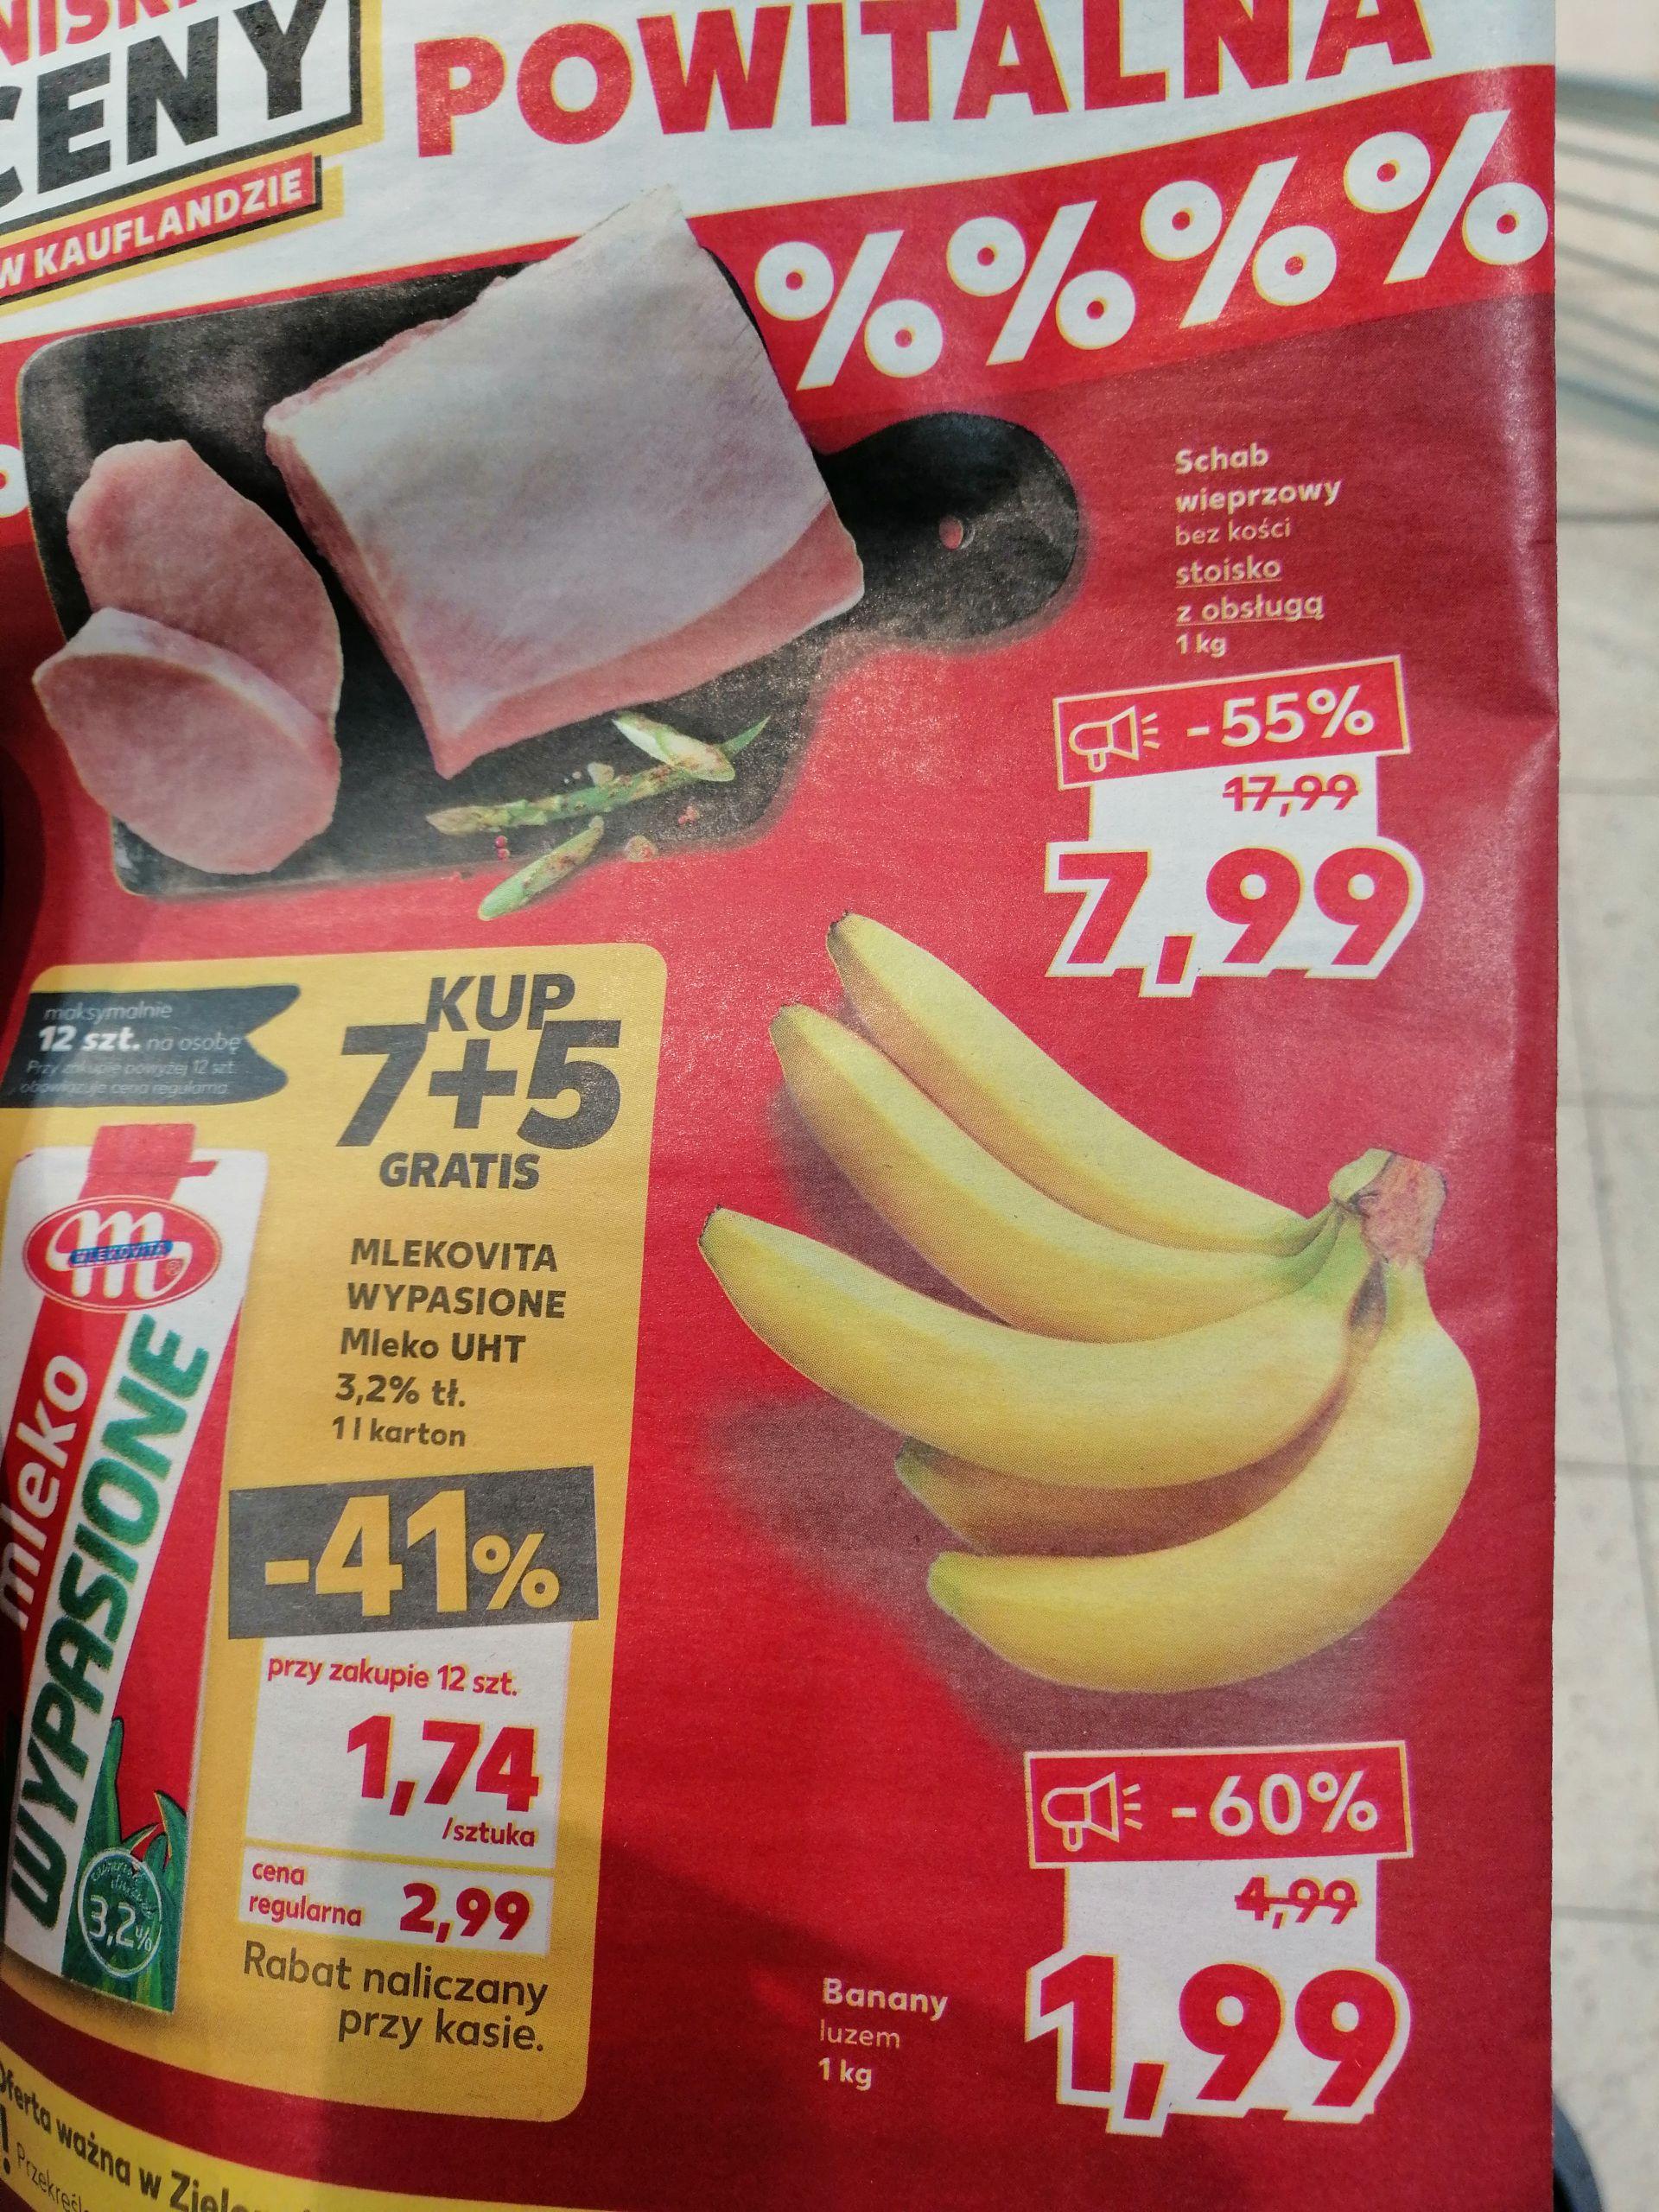 Banany 1,99/kg